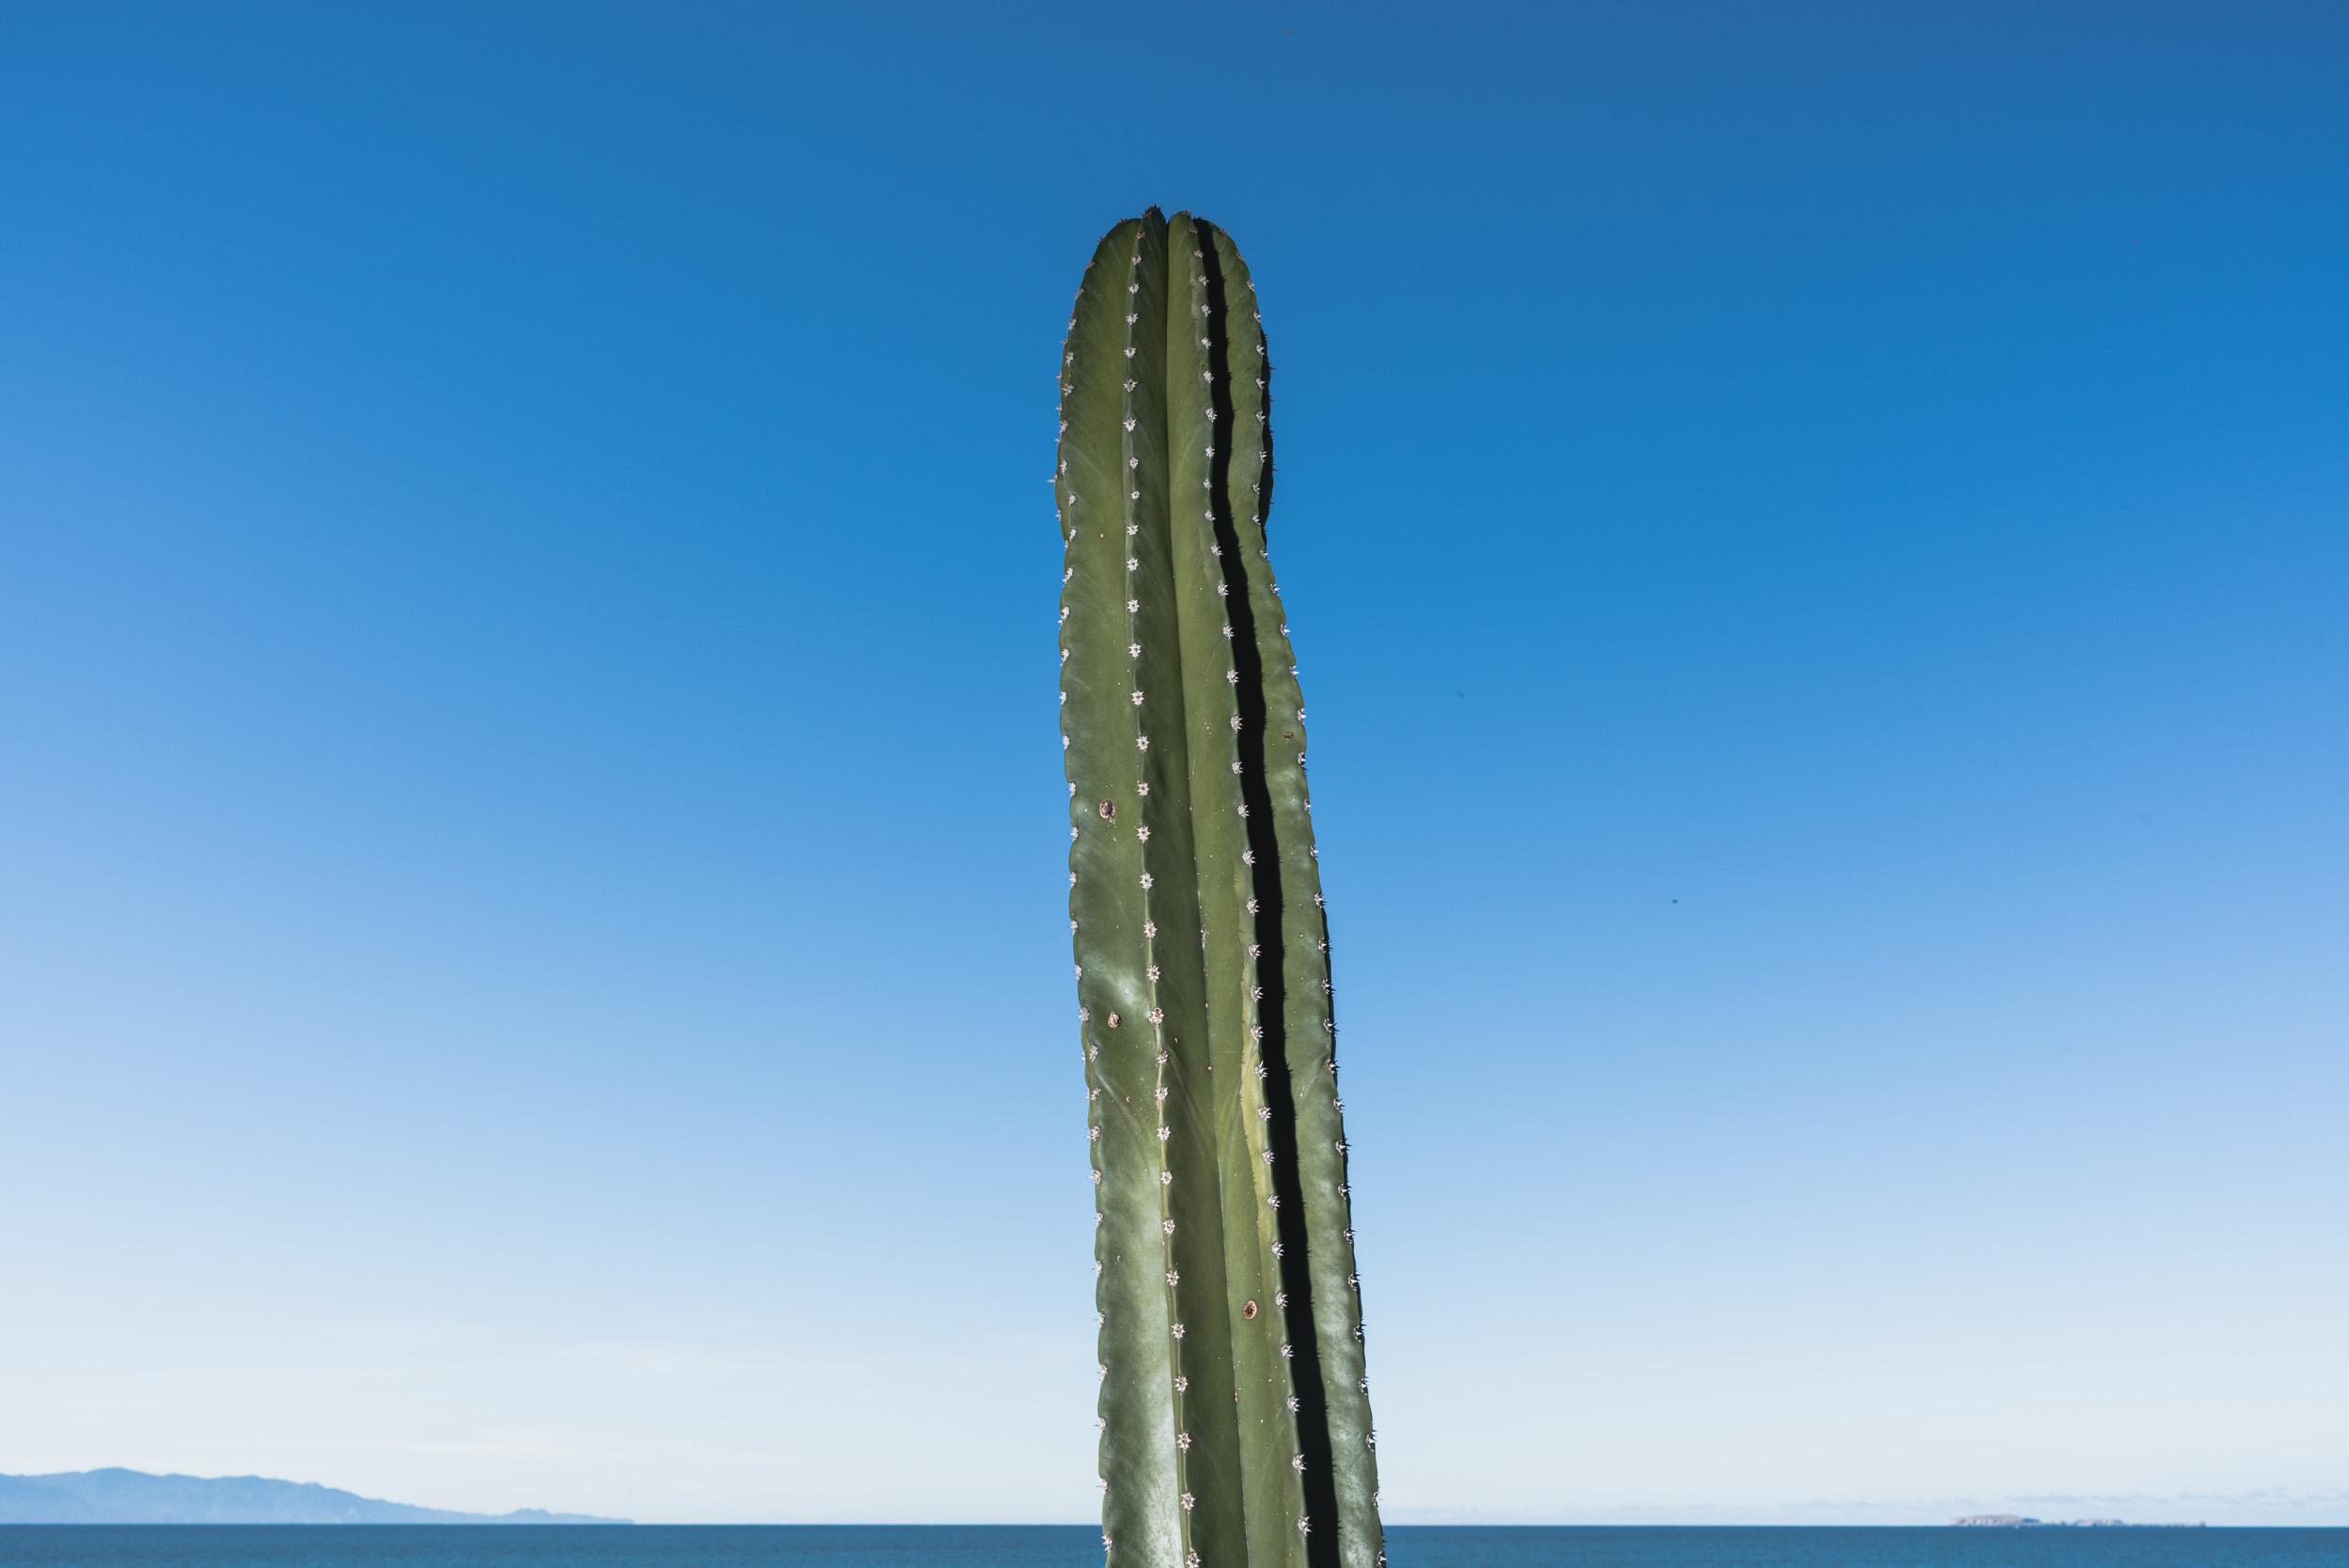 Beach cactus and sky